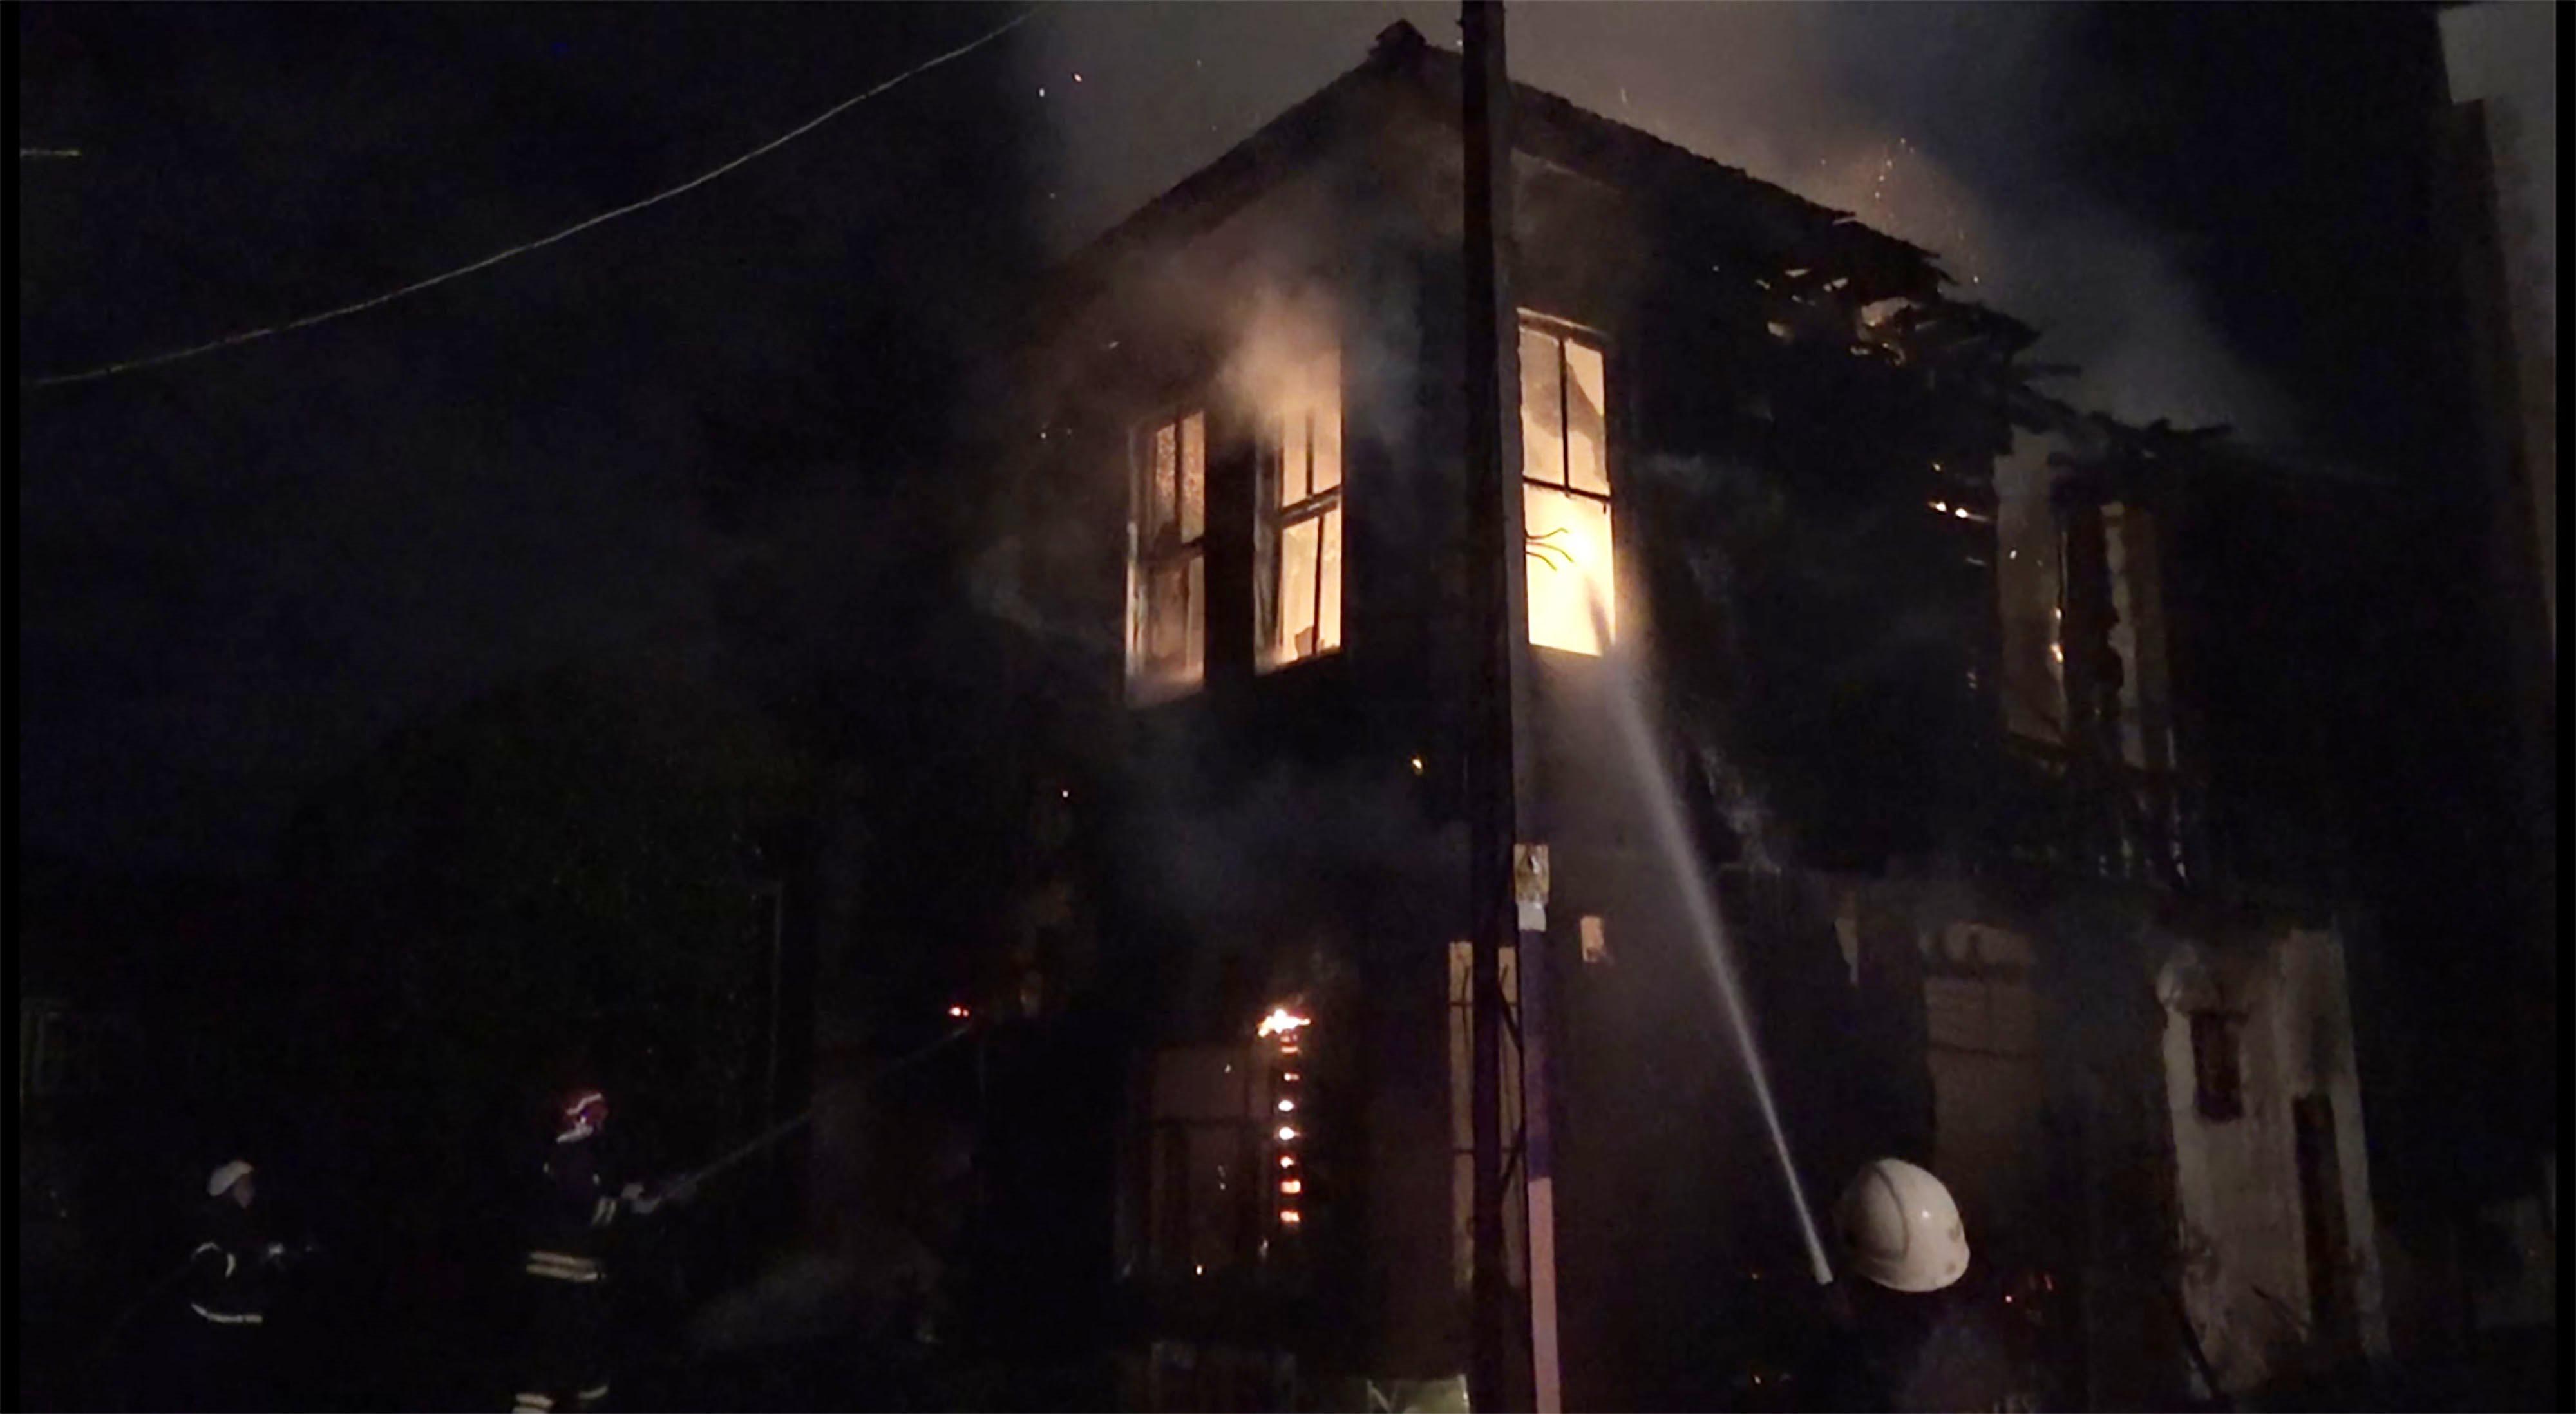 Darıca'da tarihi ahşap bina yandı